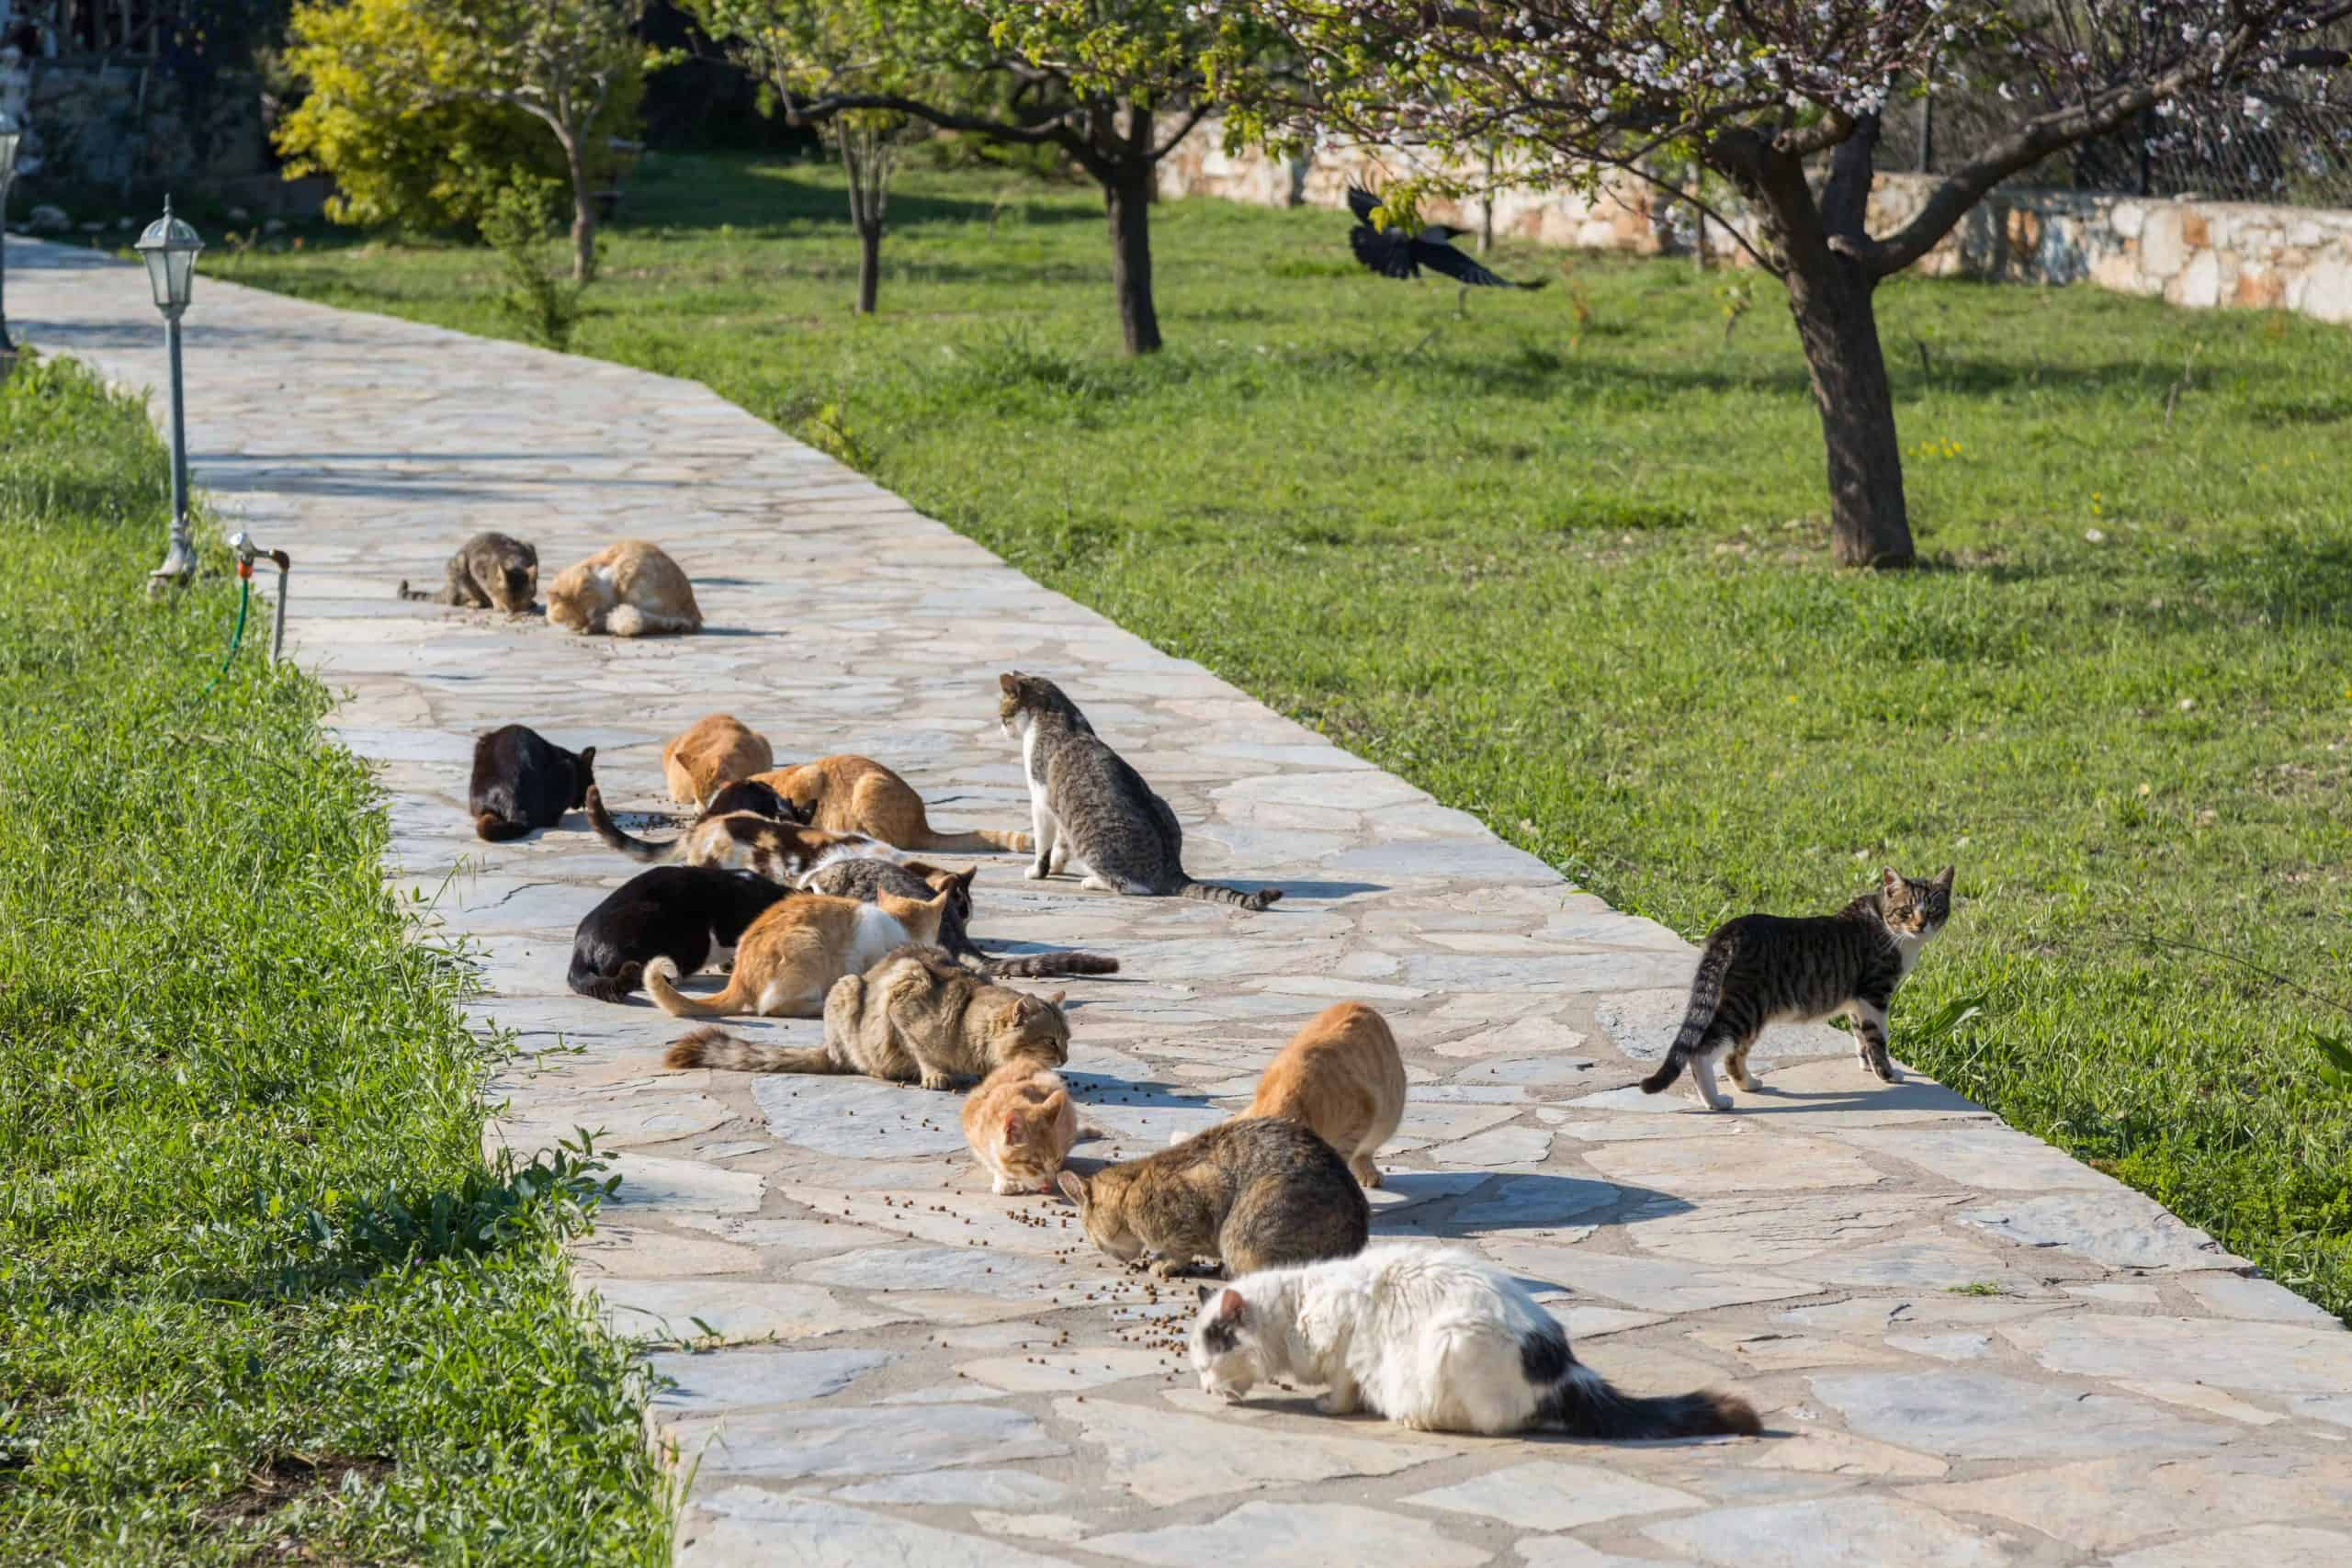 supplier management - Is Supplier Management like Herding Cats?